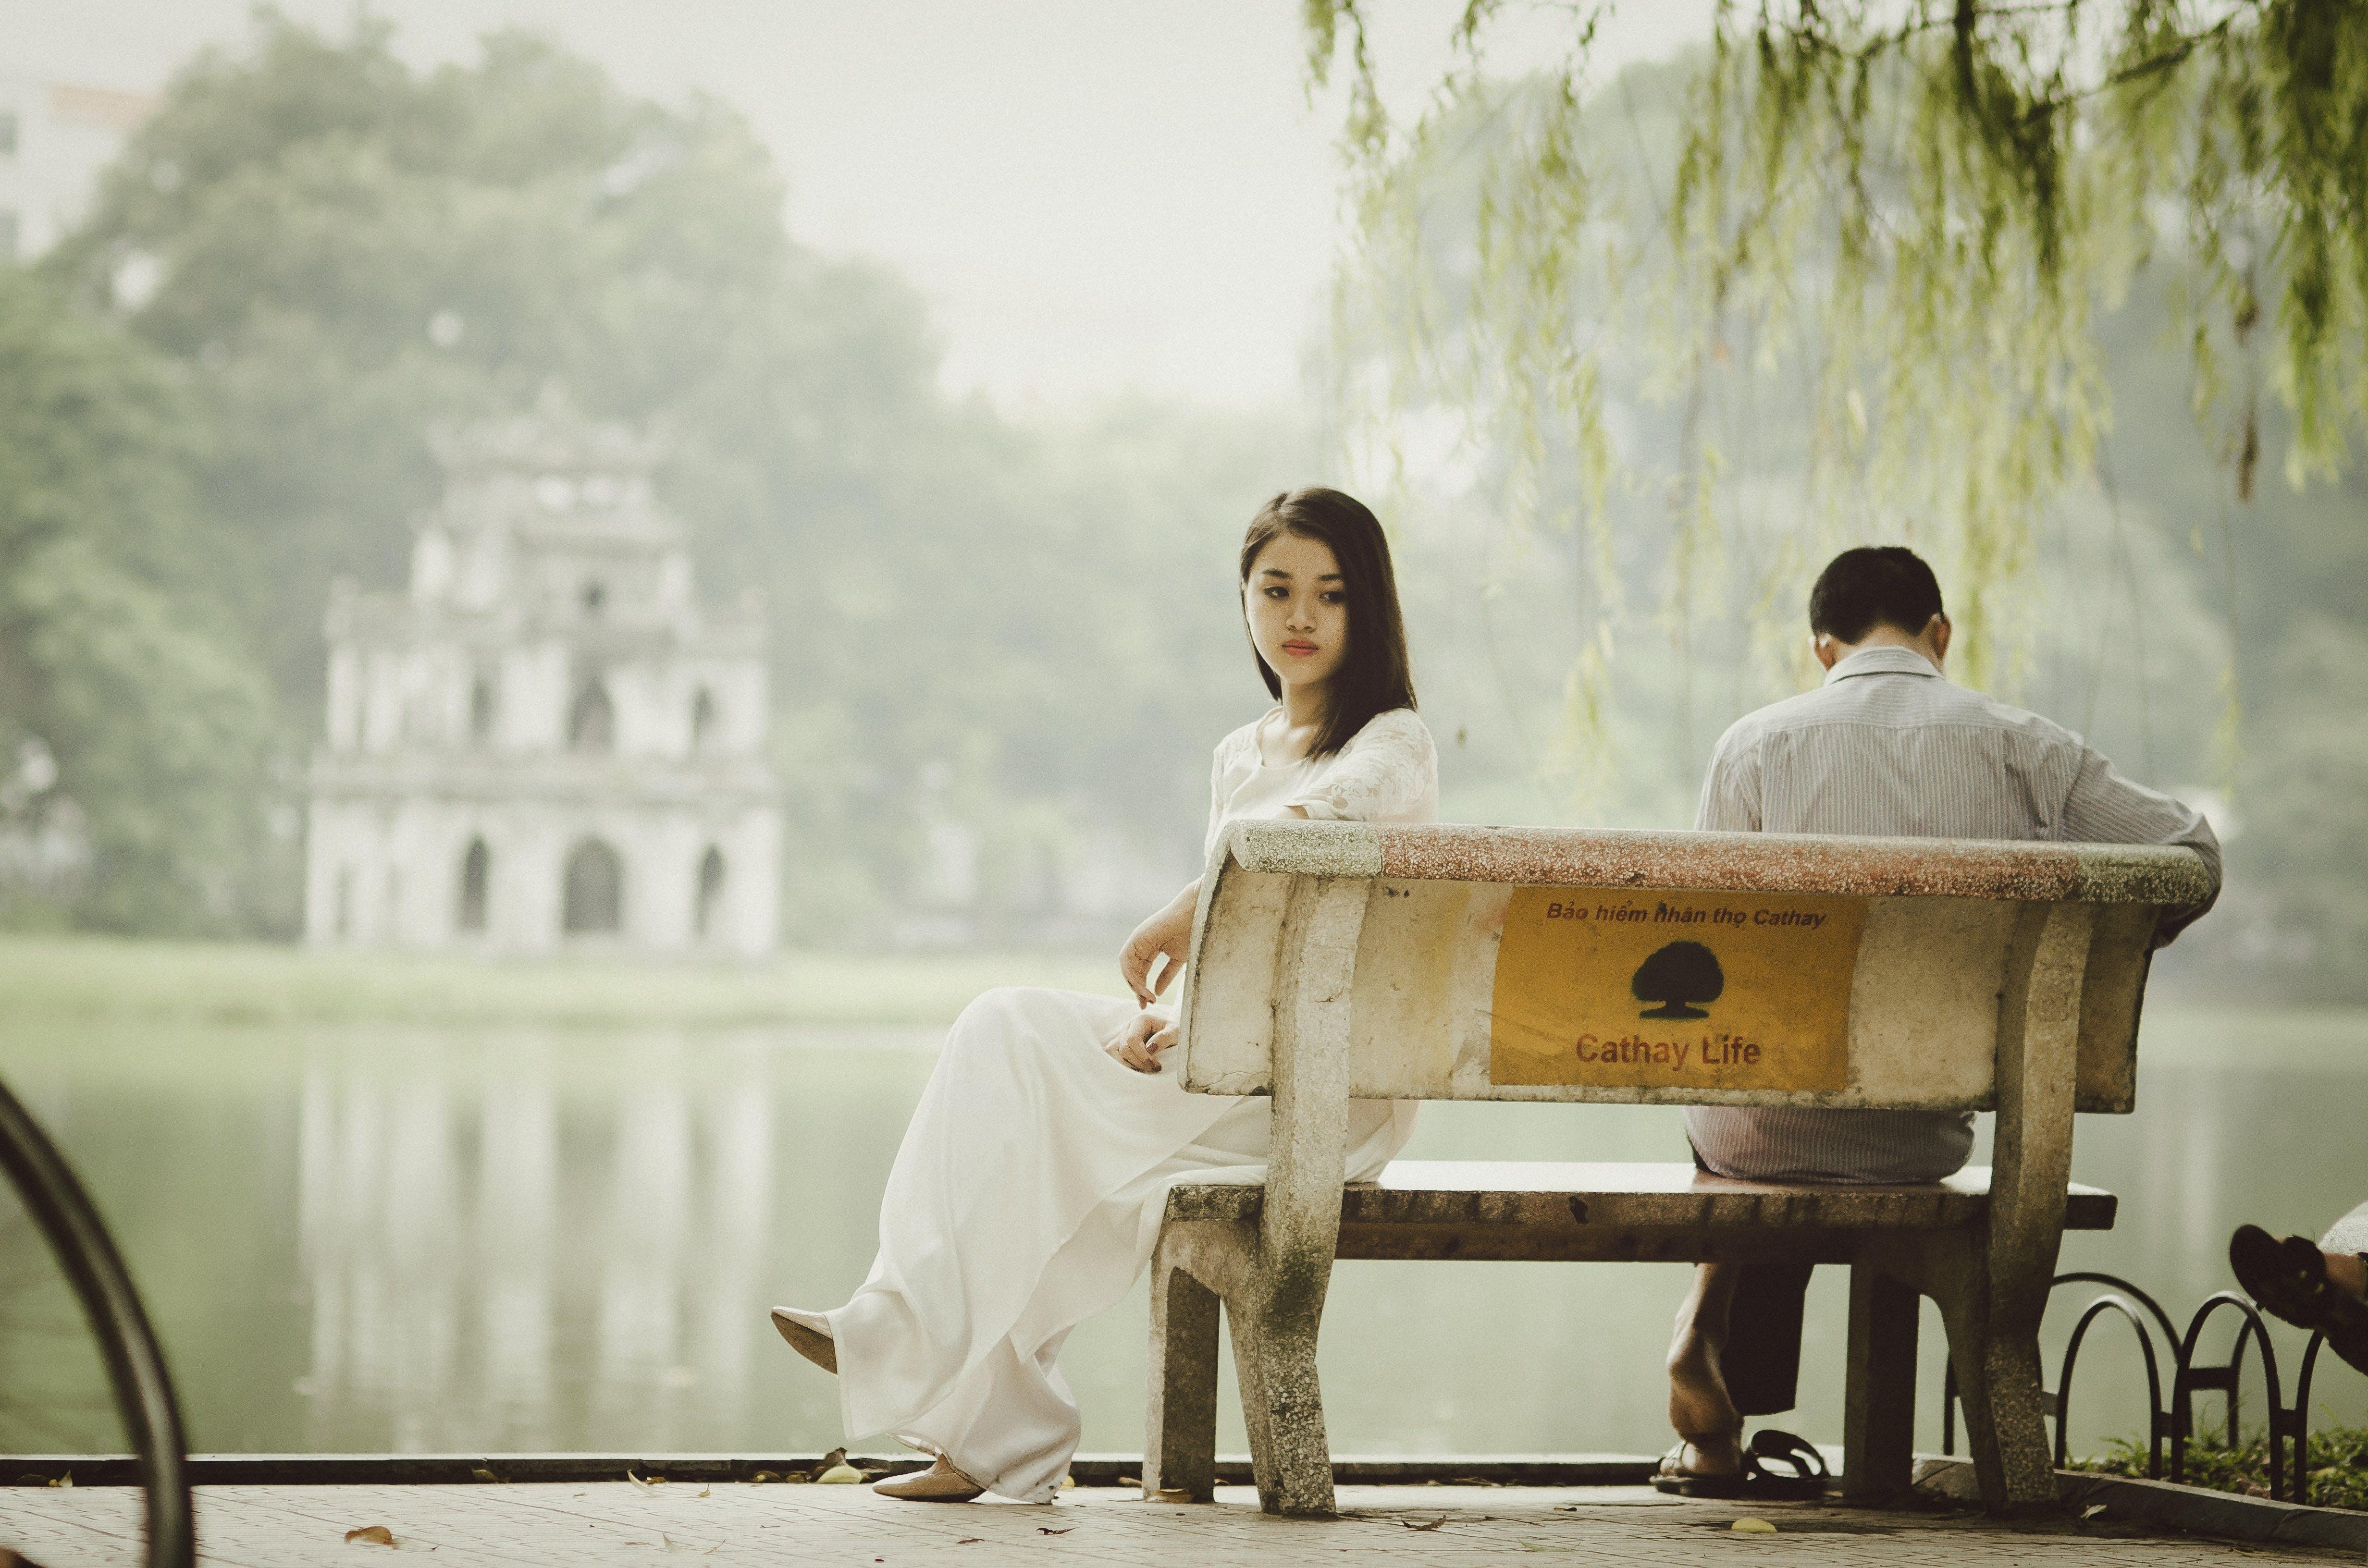 abandoned, argument, beautiful